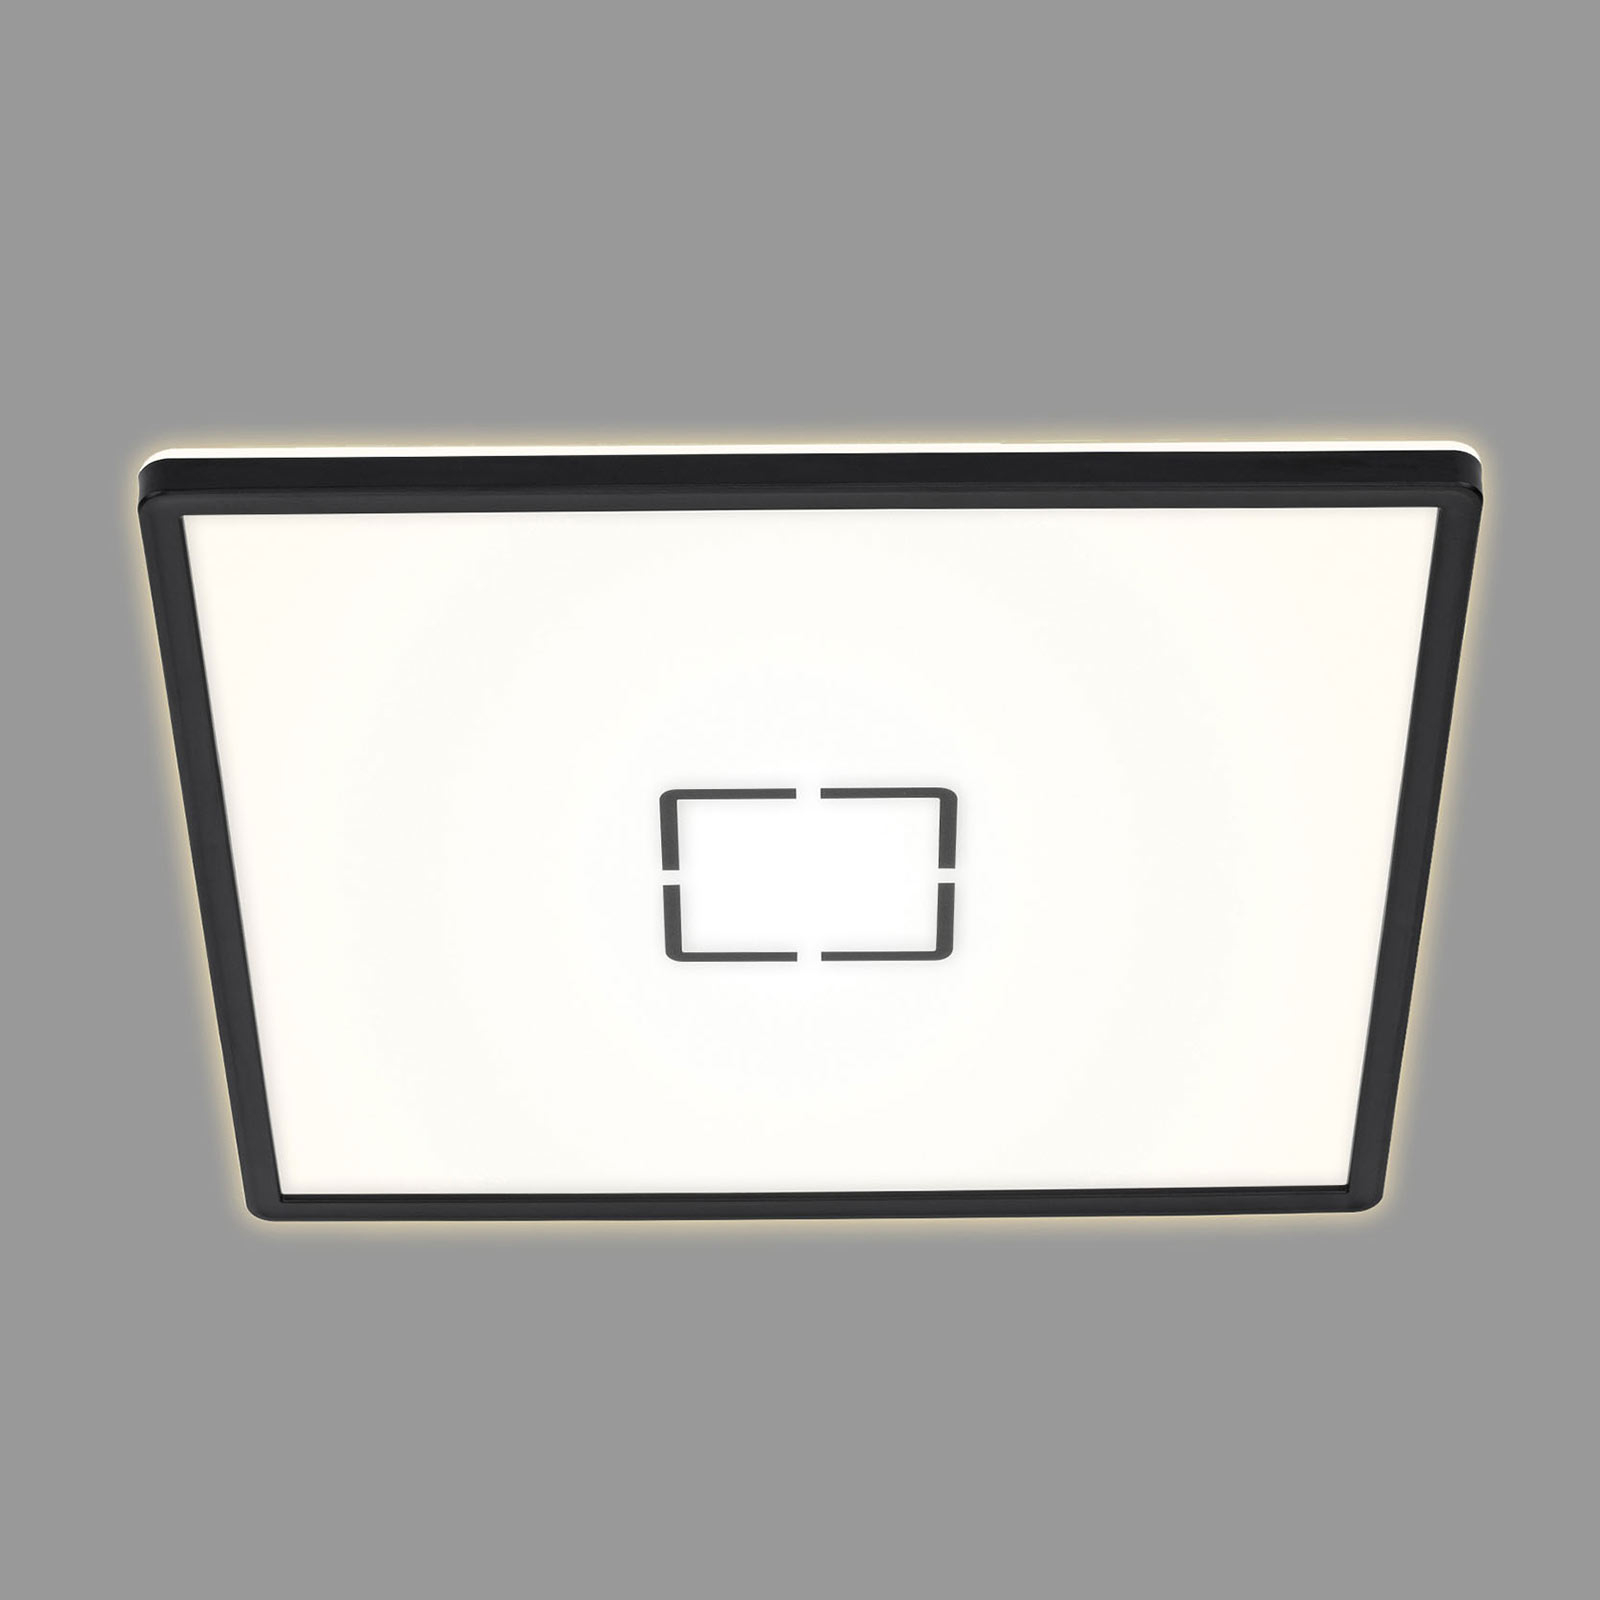 Lampa sufitowa LED Free, 42 x 42 cm, czarna